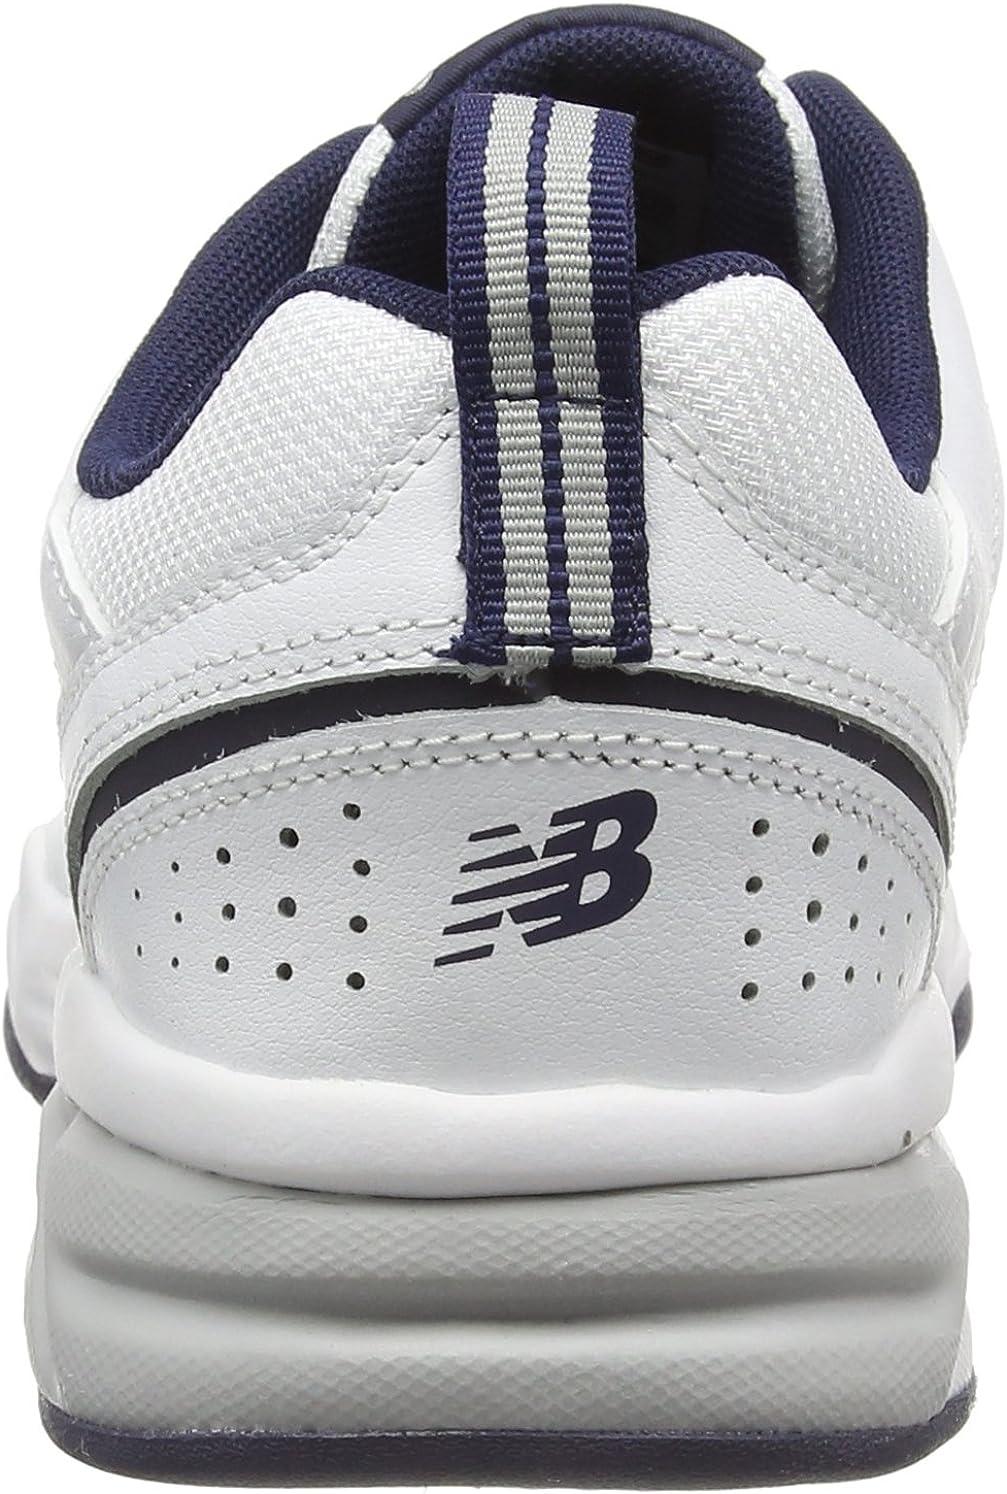 Amazon.com | New Balance 624V4, Men's Running Shoes | Road Running